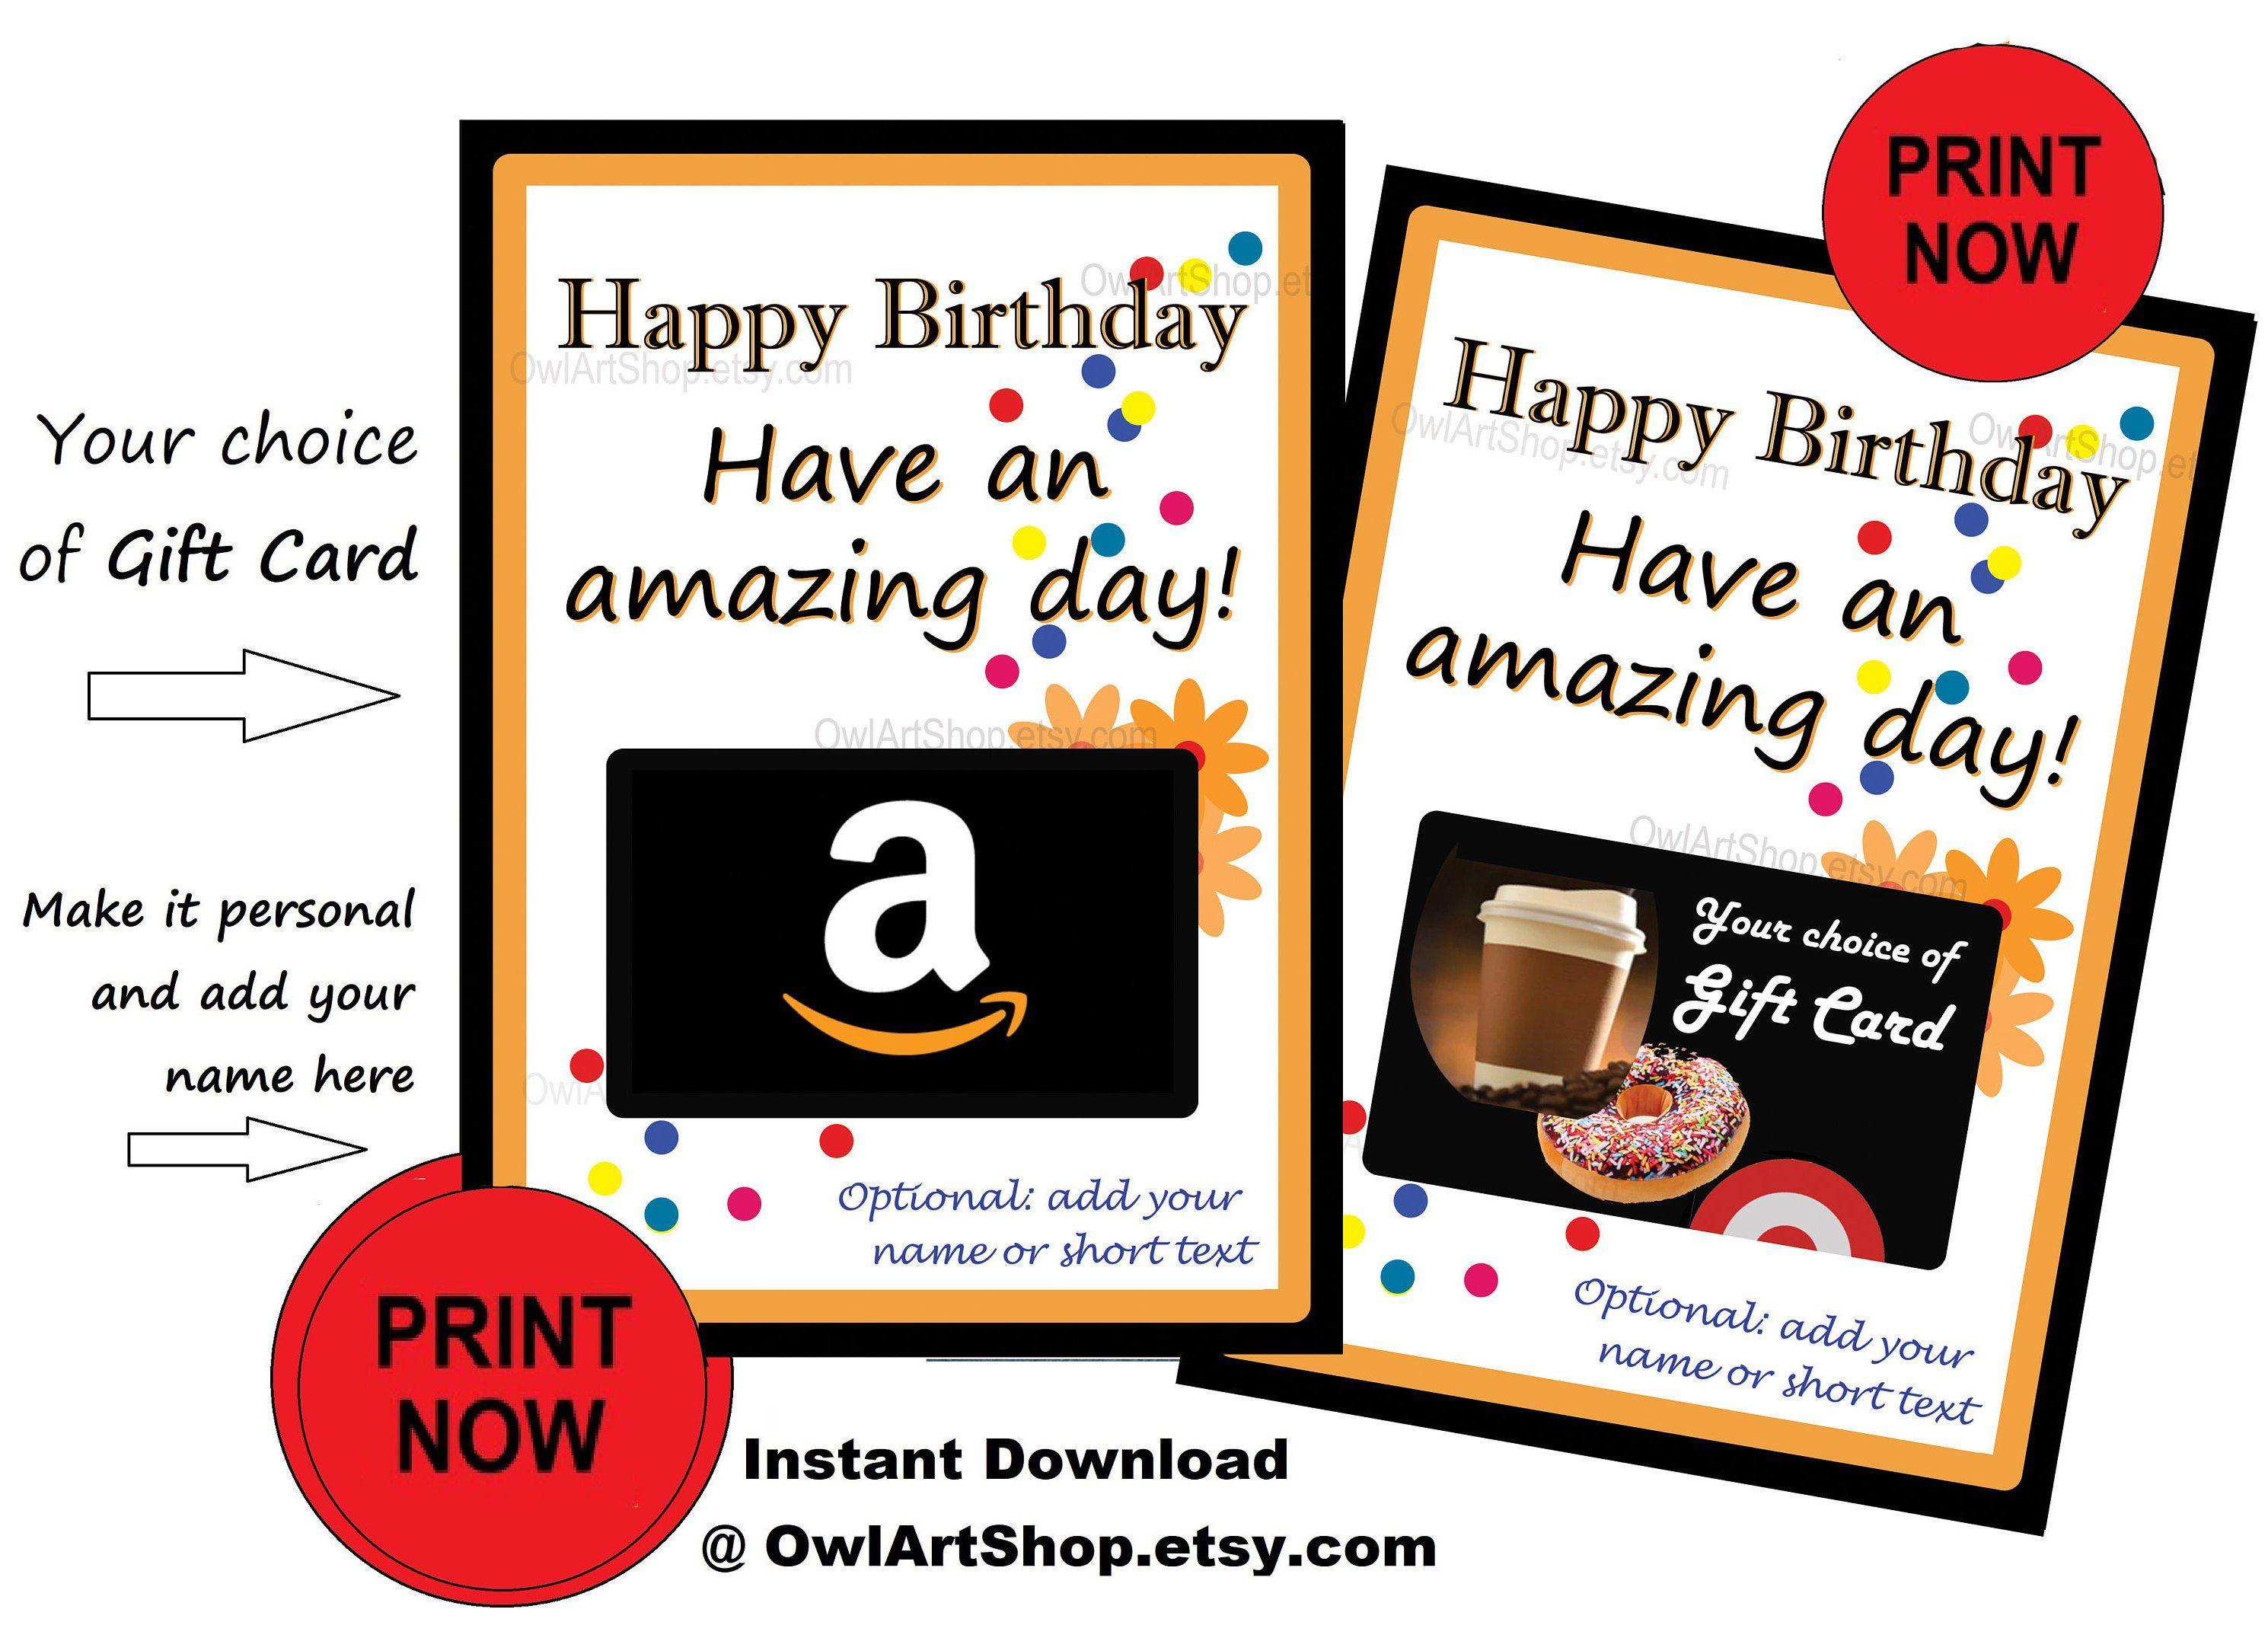 Happy Birthday Card Holder Amazon Gift Card Holder Amazing Etsy Birthday Card Holder Printable Gift Cards Gift Card Holder